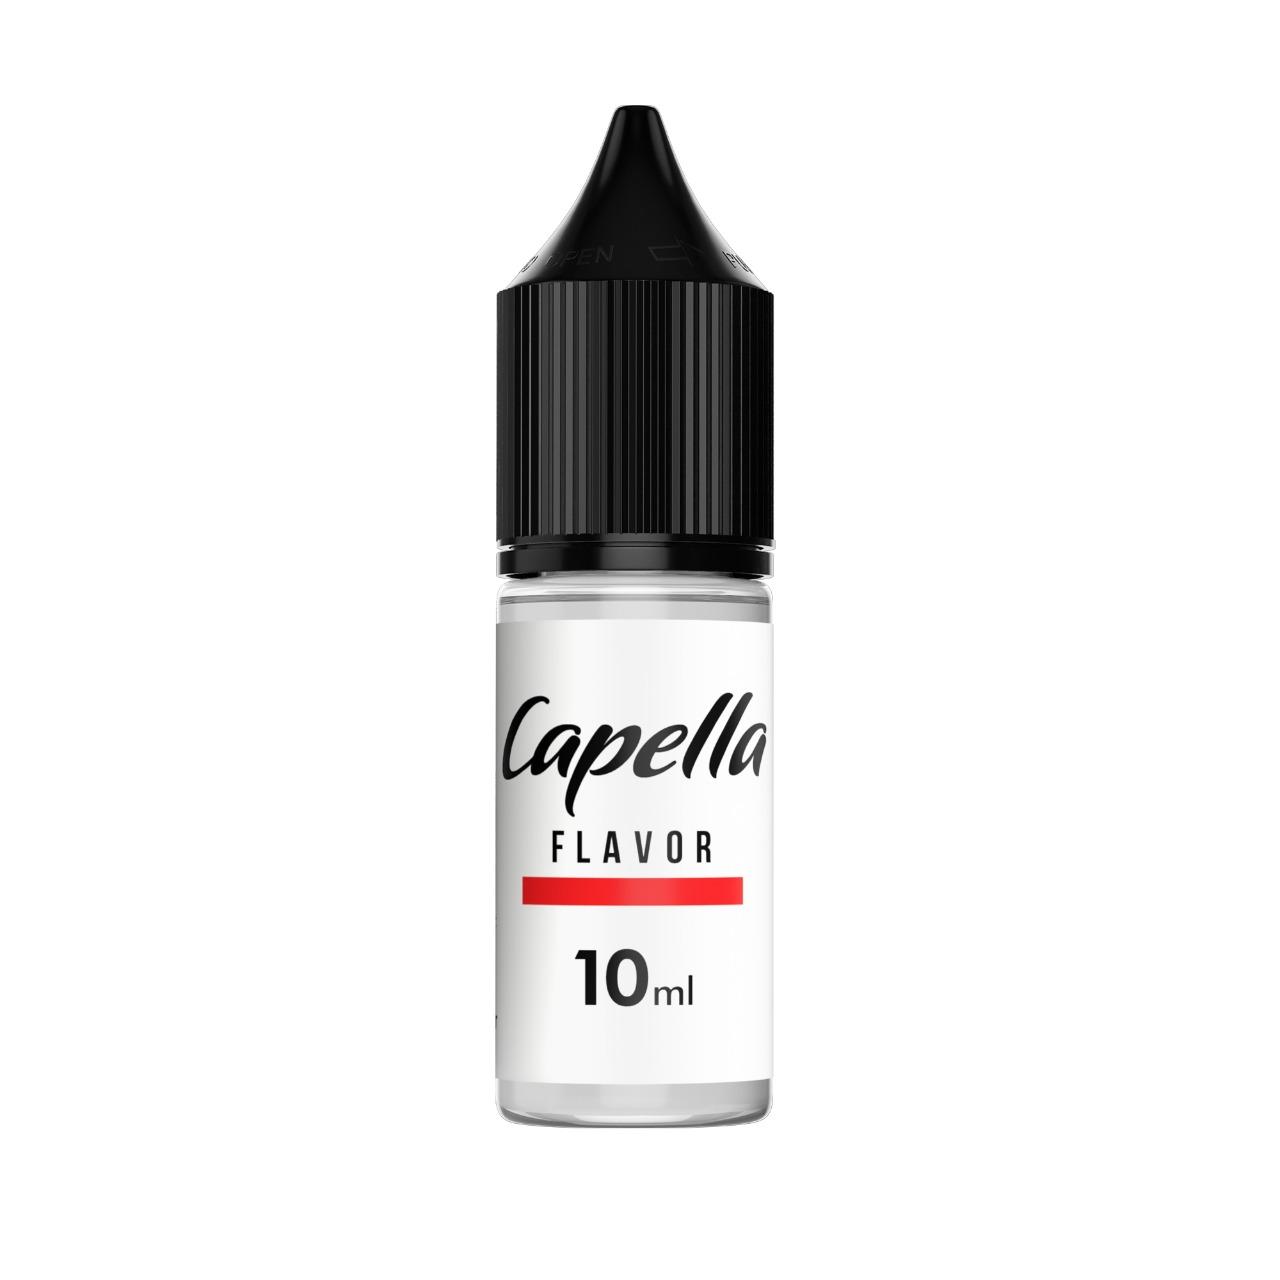 Capella (CAP) Italian Lemon Sicily 10ml